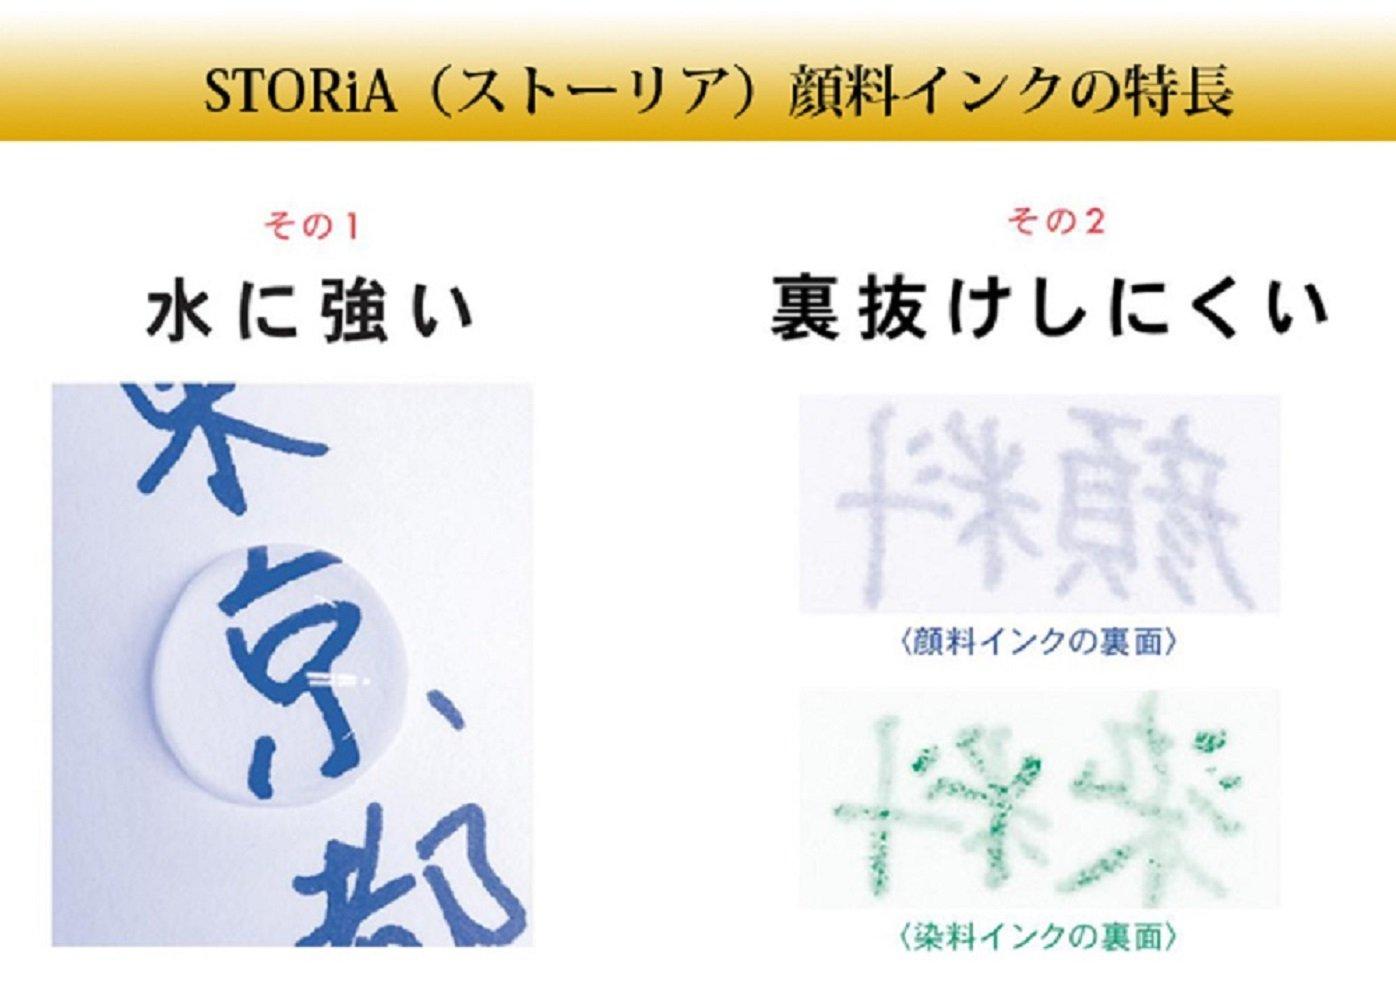 Sailor Fountain Pen mini Bottle 20ml Ink 8 Color Gift Set - Pigment Based '' STORiA '' by Sailor (Image #3)